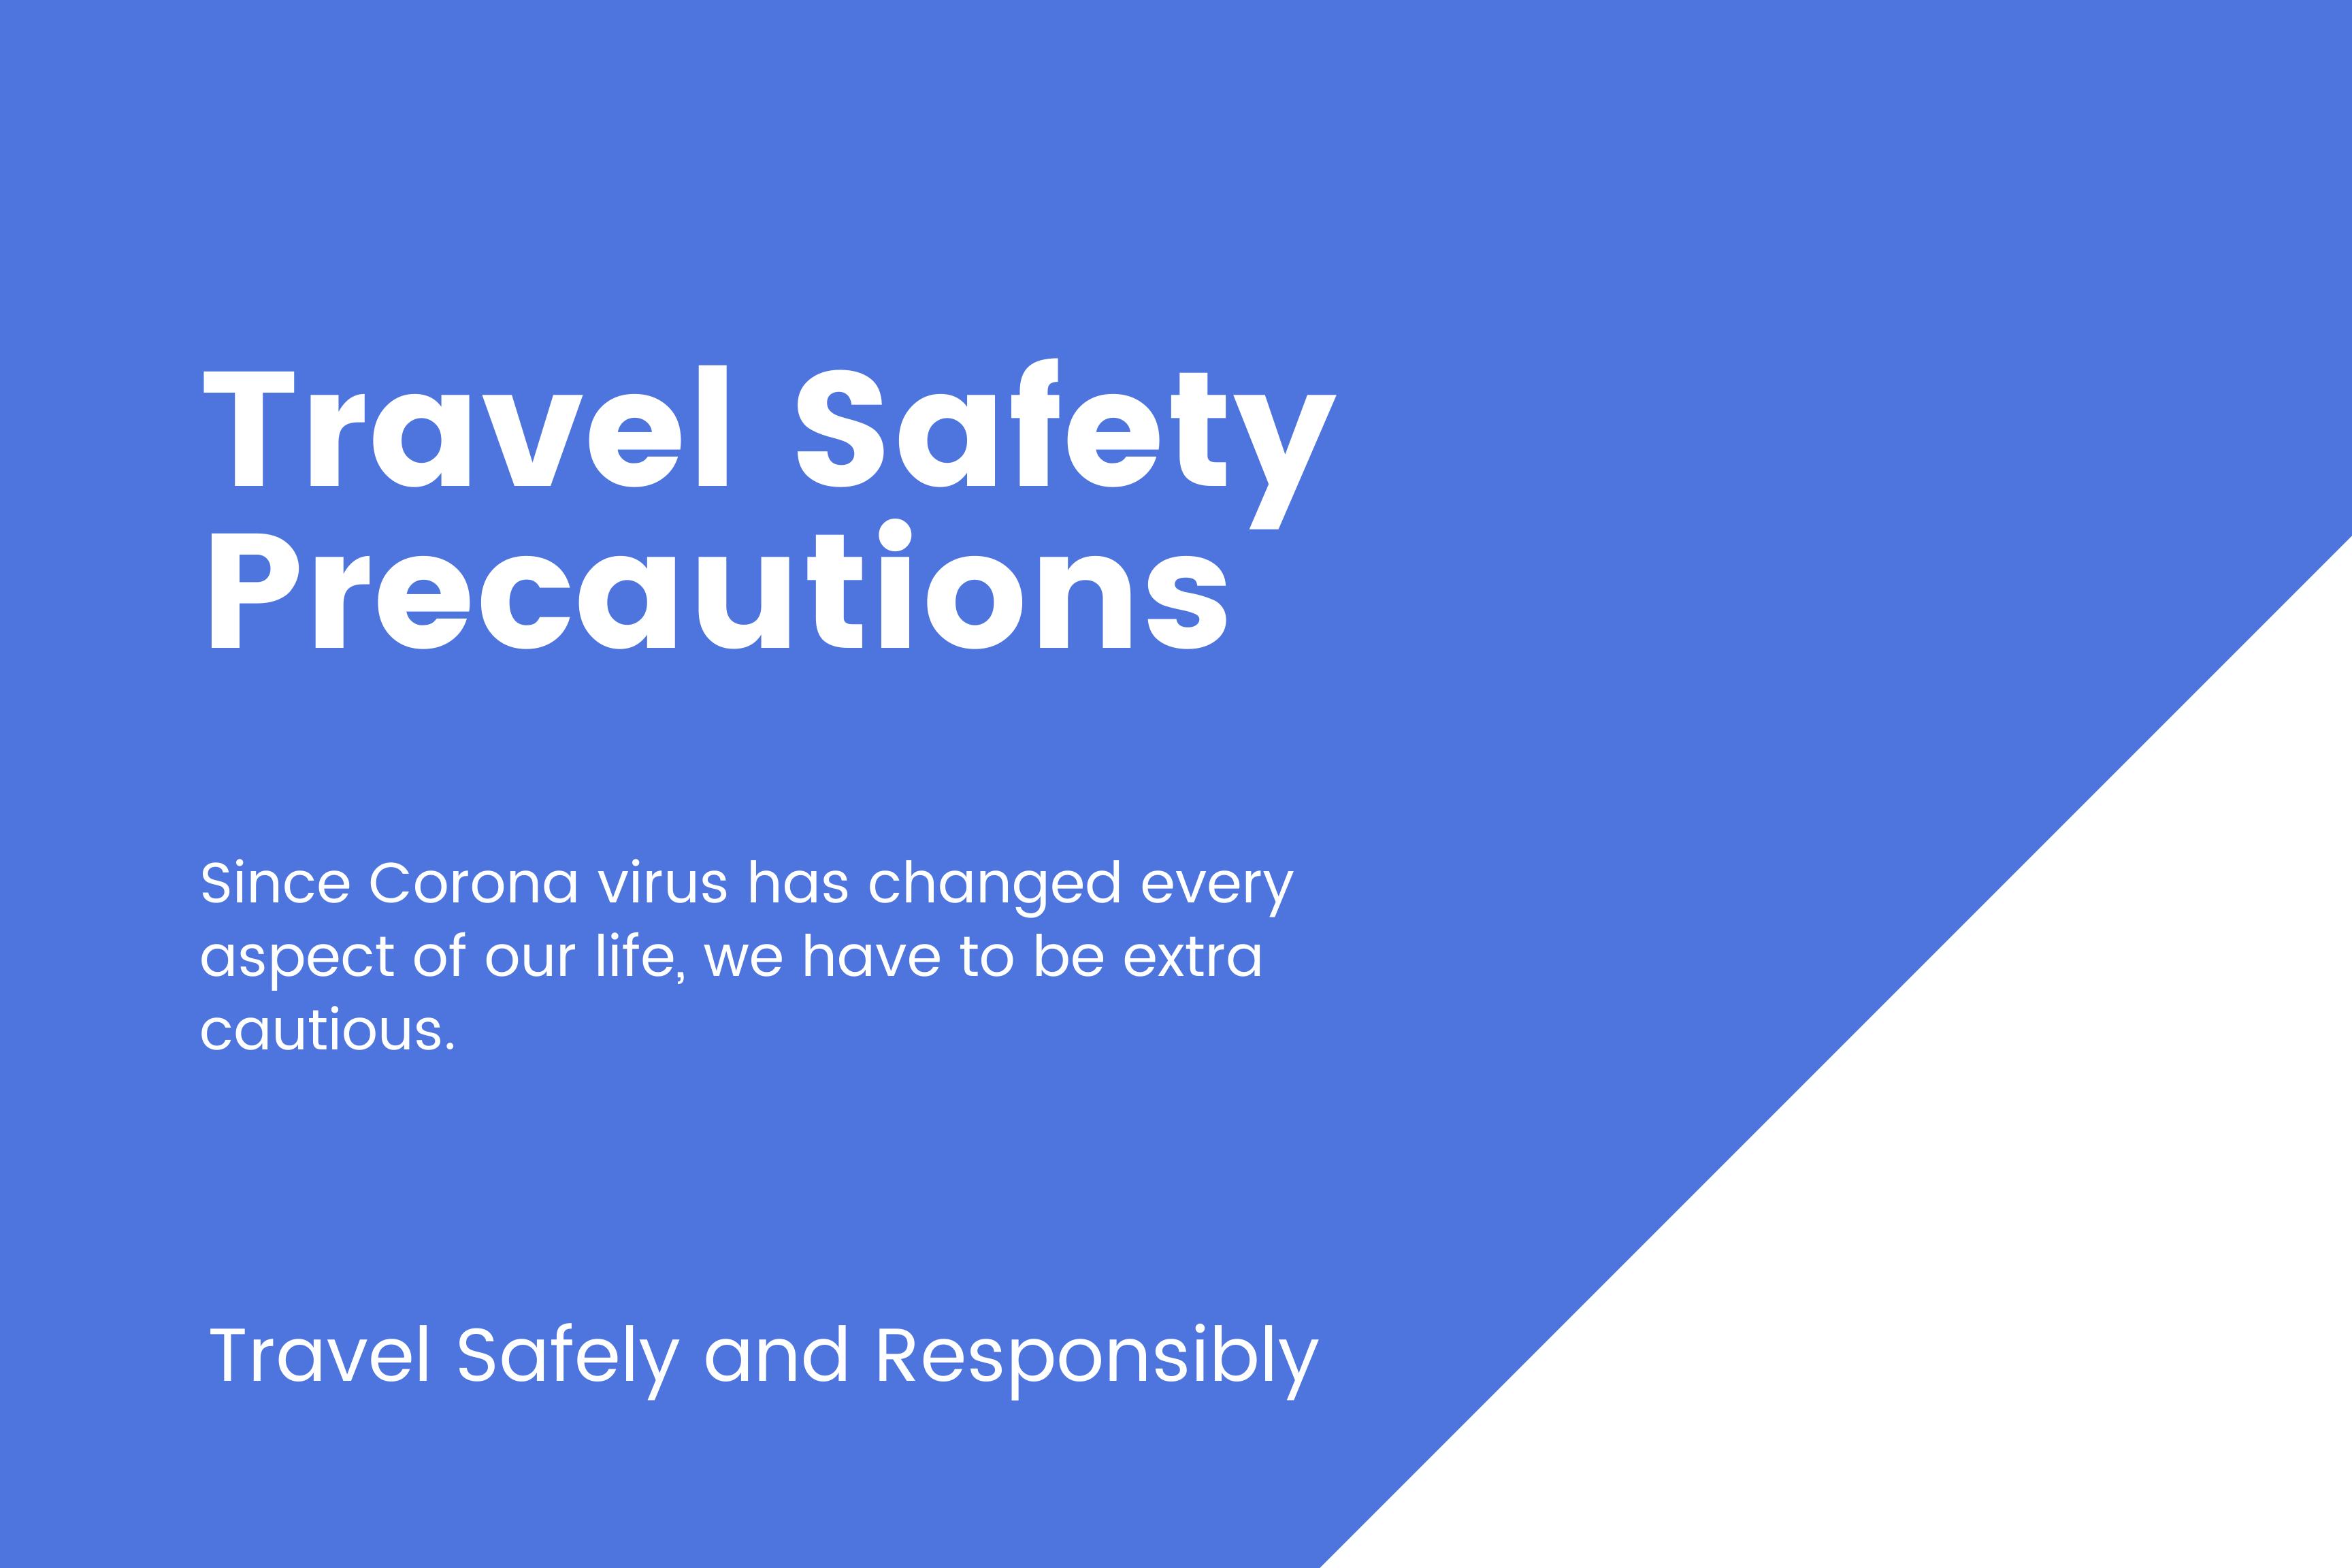 Travel Safety Precautions